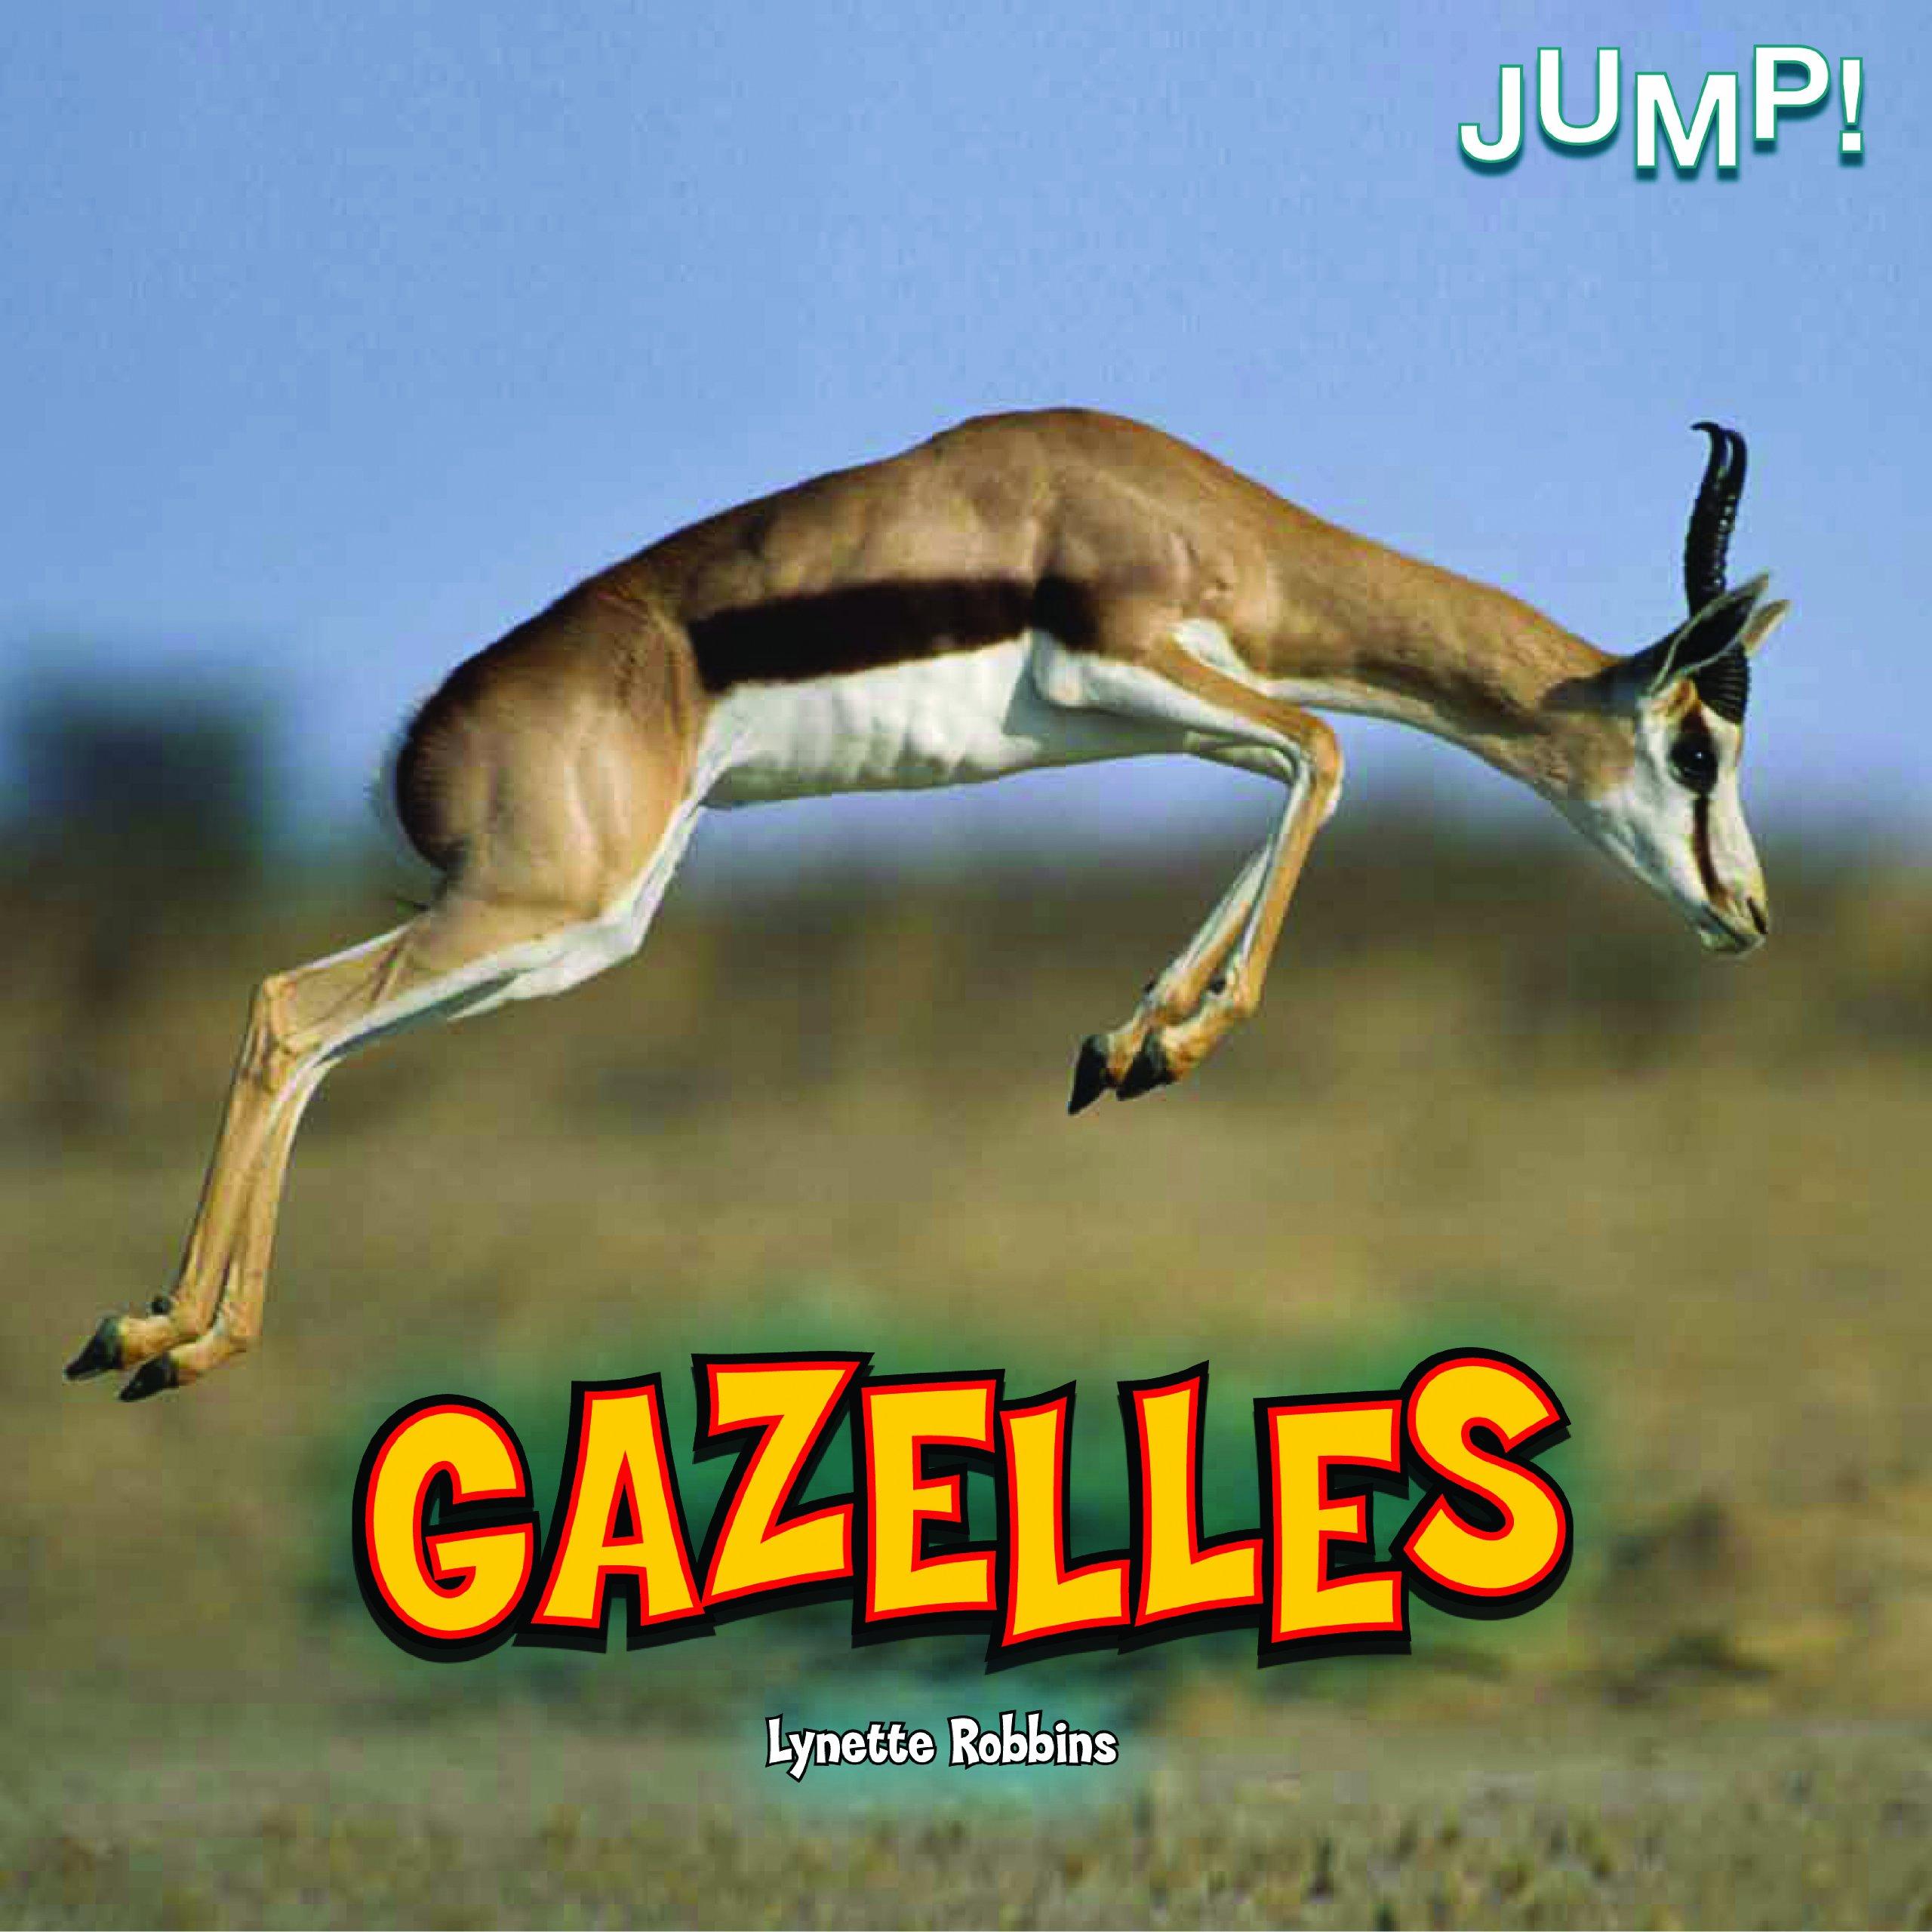 Gazelles photo